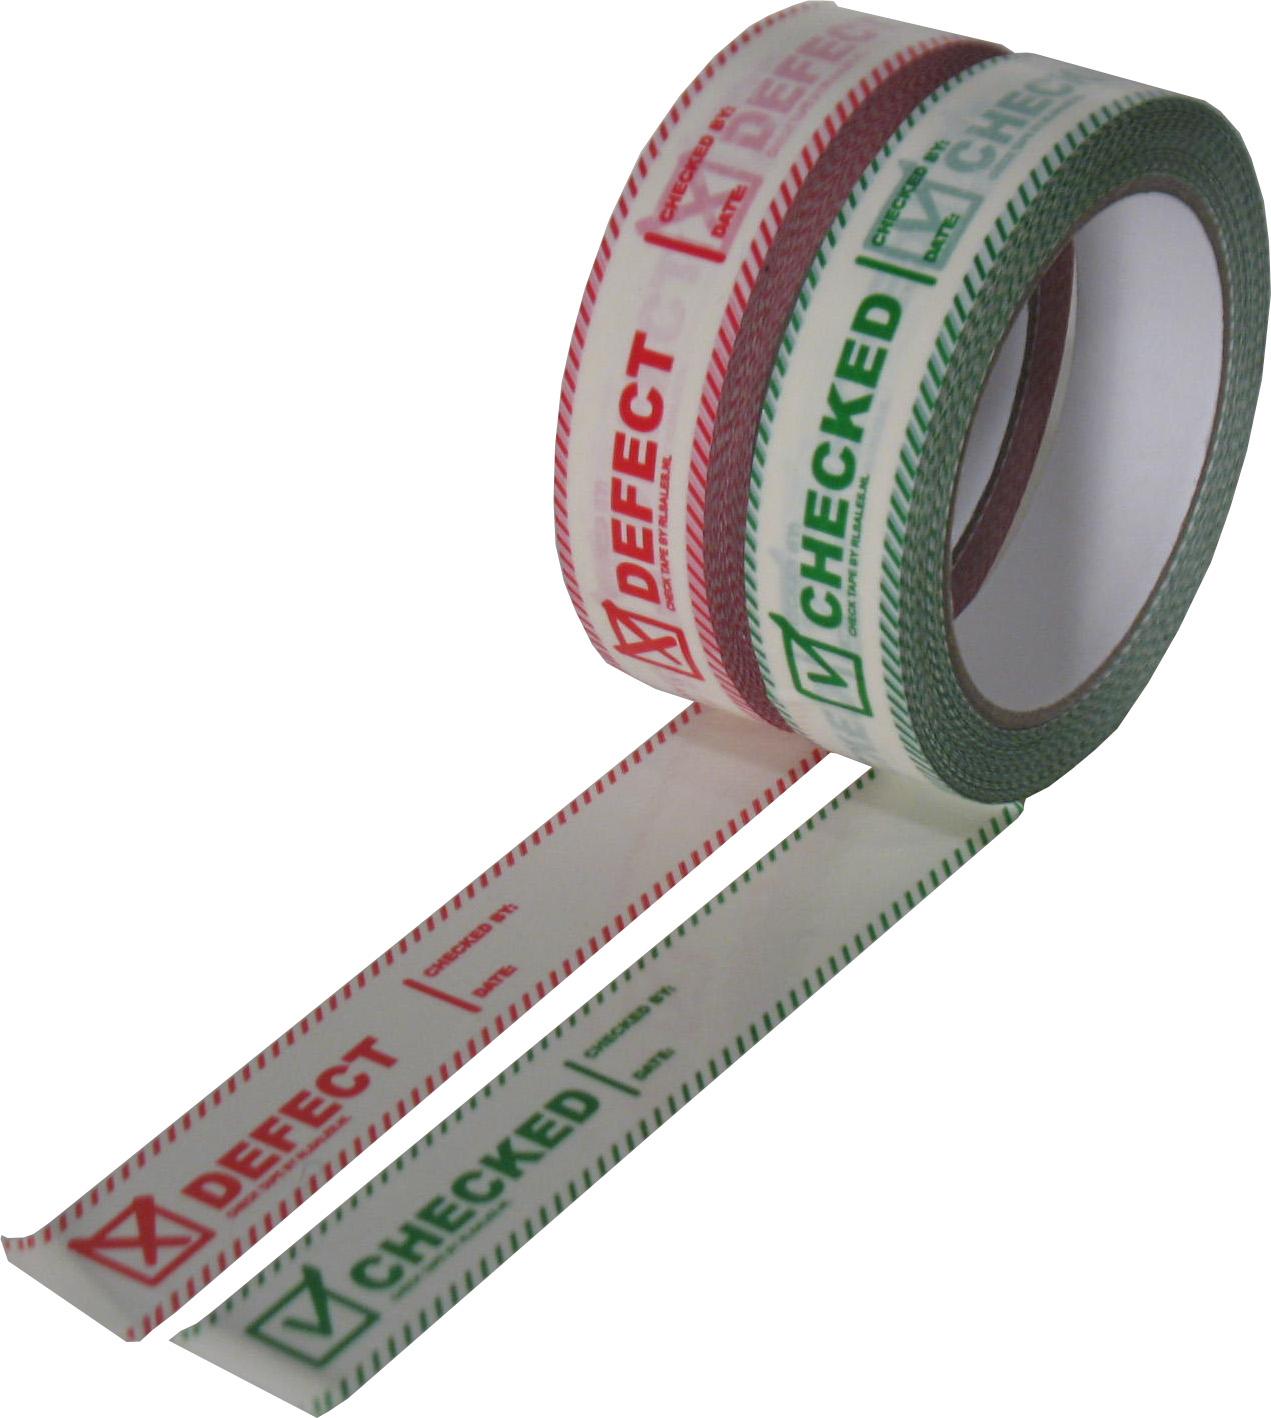 Gaffergear PVC Checked en Defect tape set